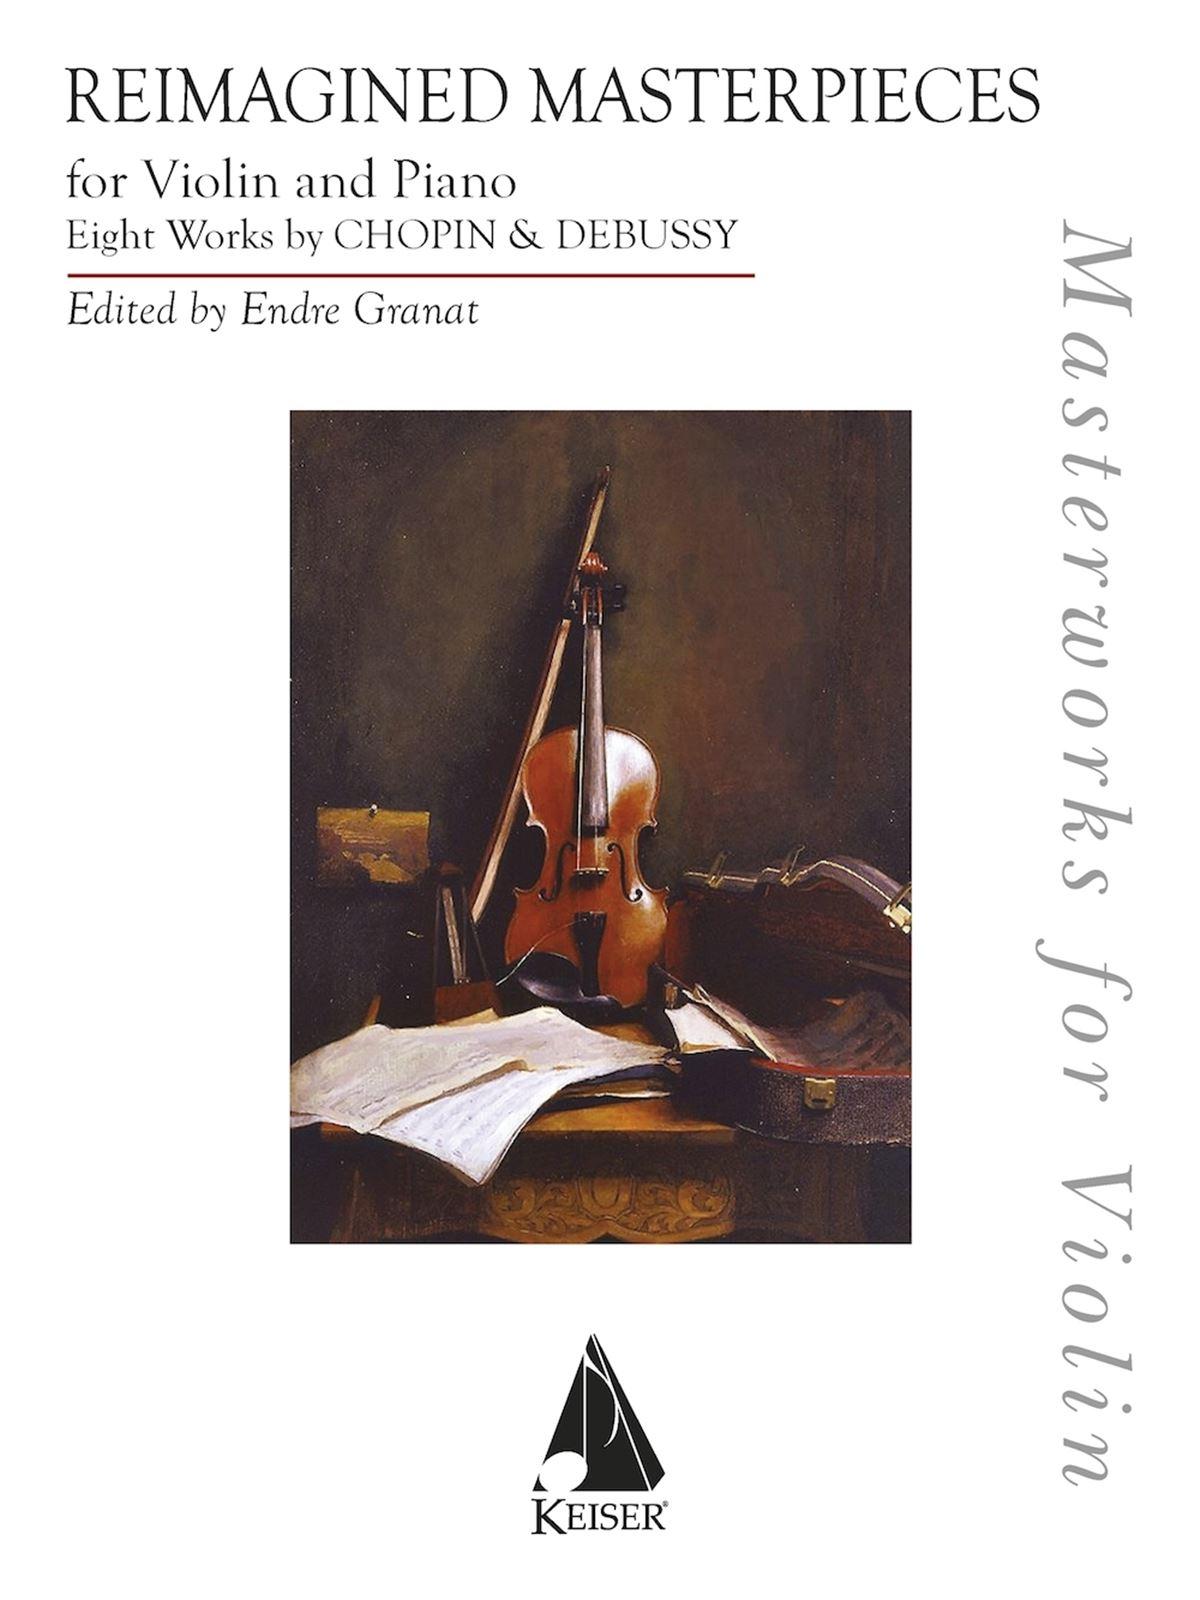 Frederic Chopin Jascha Heifetz Claude Debussy: Reimagined Masterpieces for